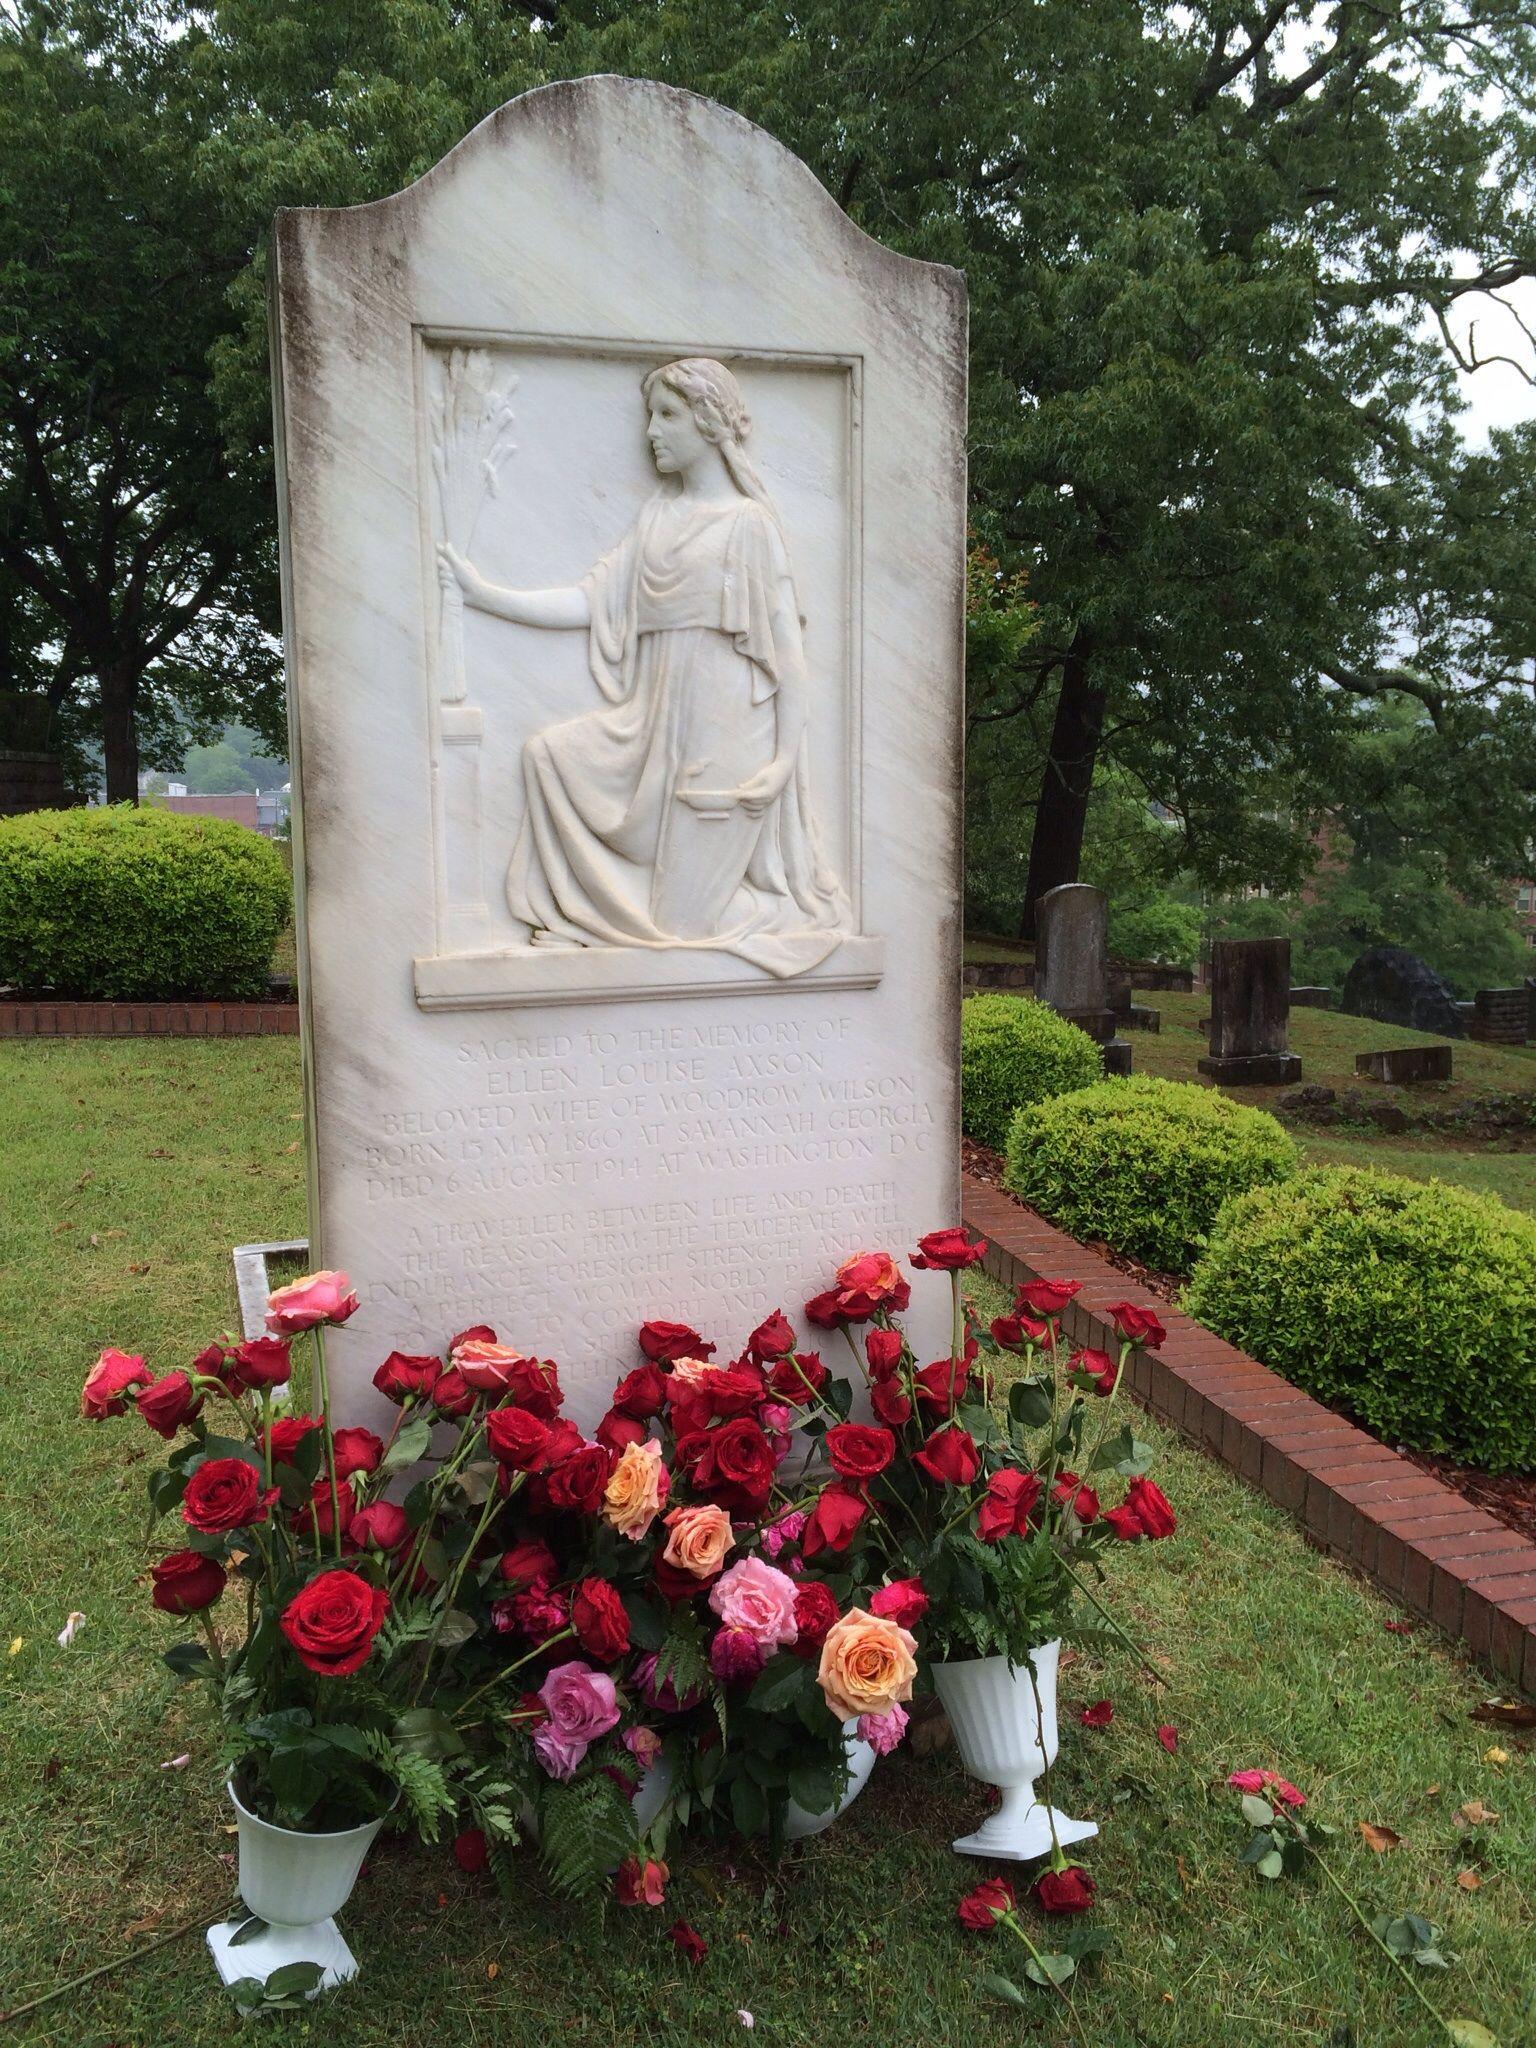 ellen axson wilson wife of president woodrow wilson is buried at ellen axson wilson wife of president woodrow wilson is buried at myrtle hill cemetery